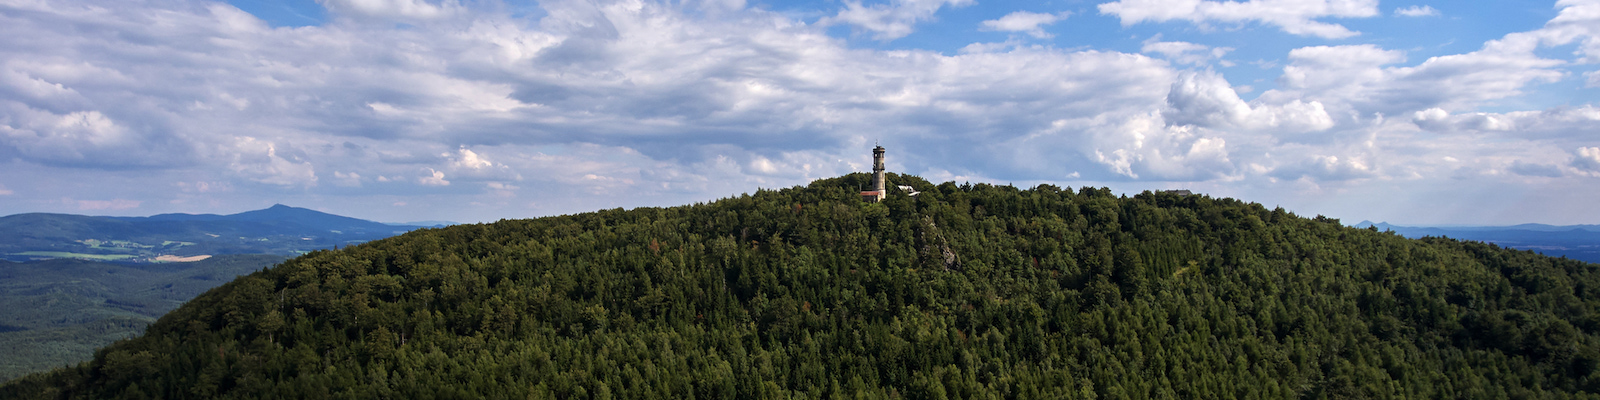 Zittauer Gebirge - Große Kesseltour